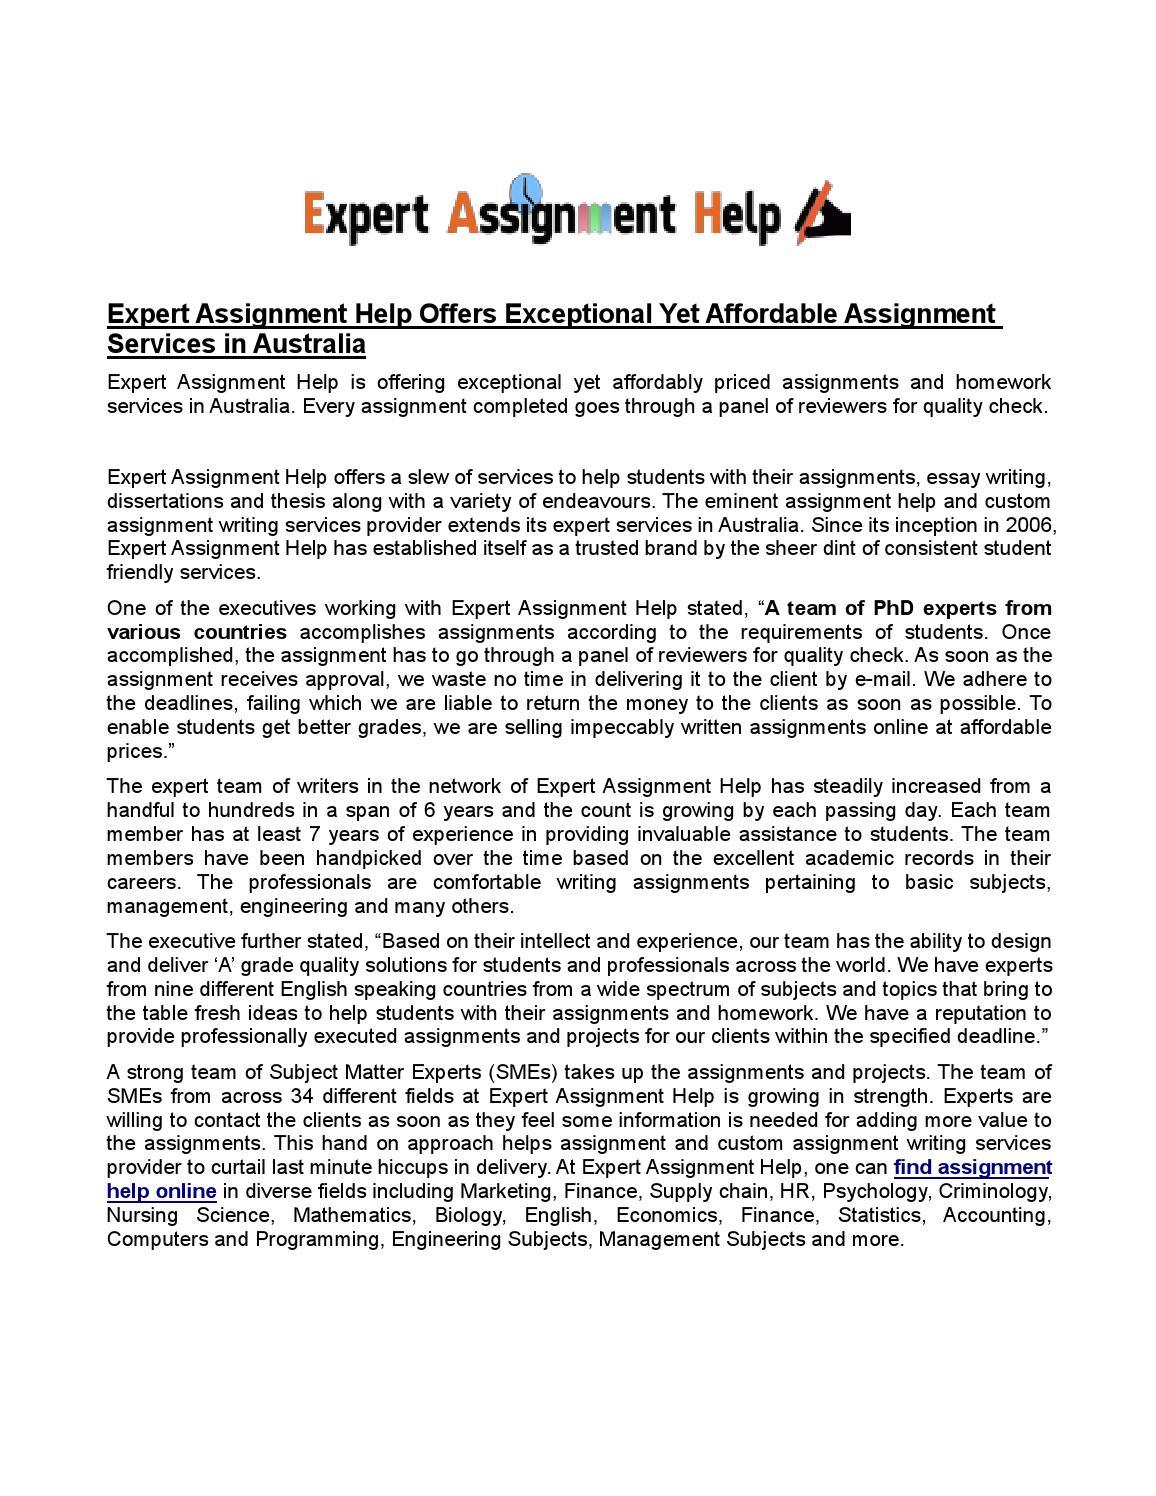 Graduate paper writing service